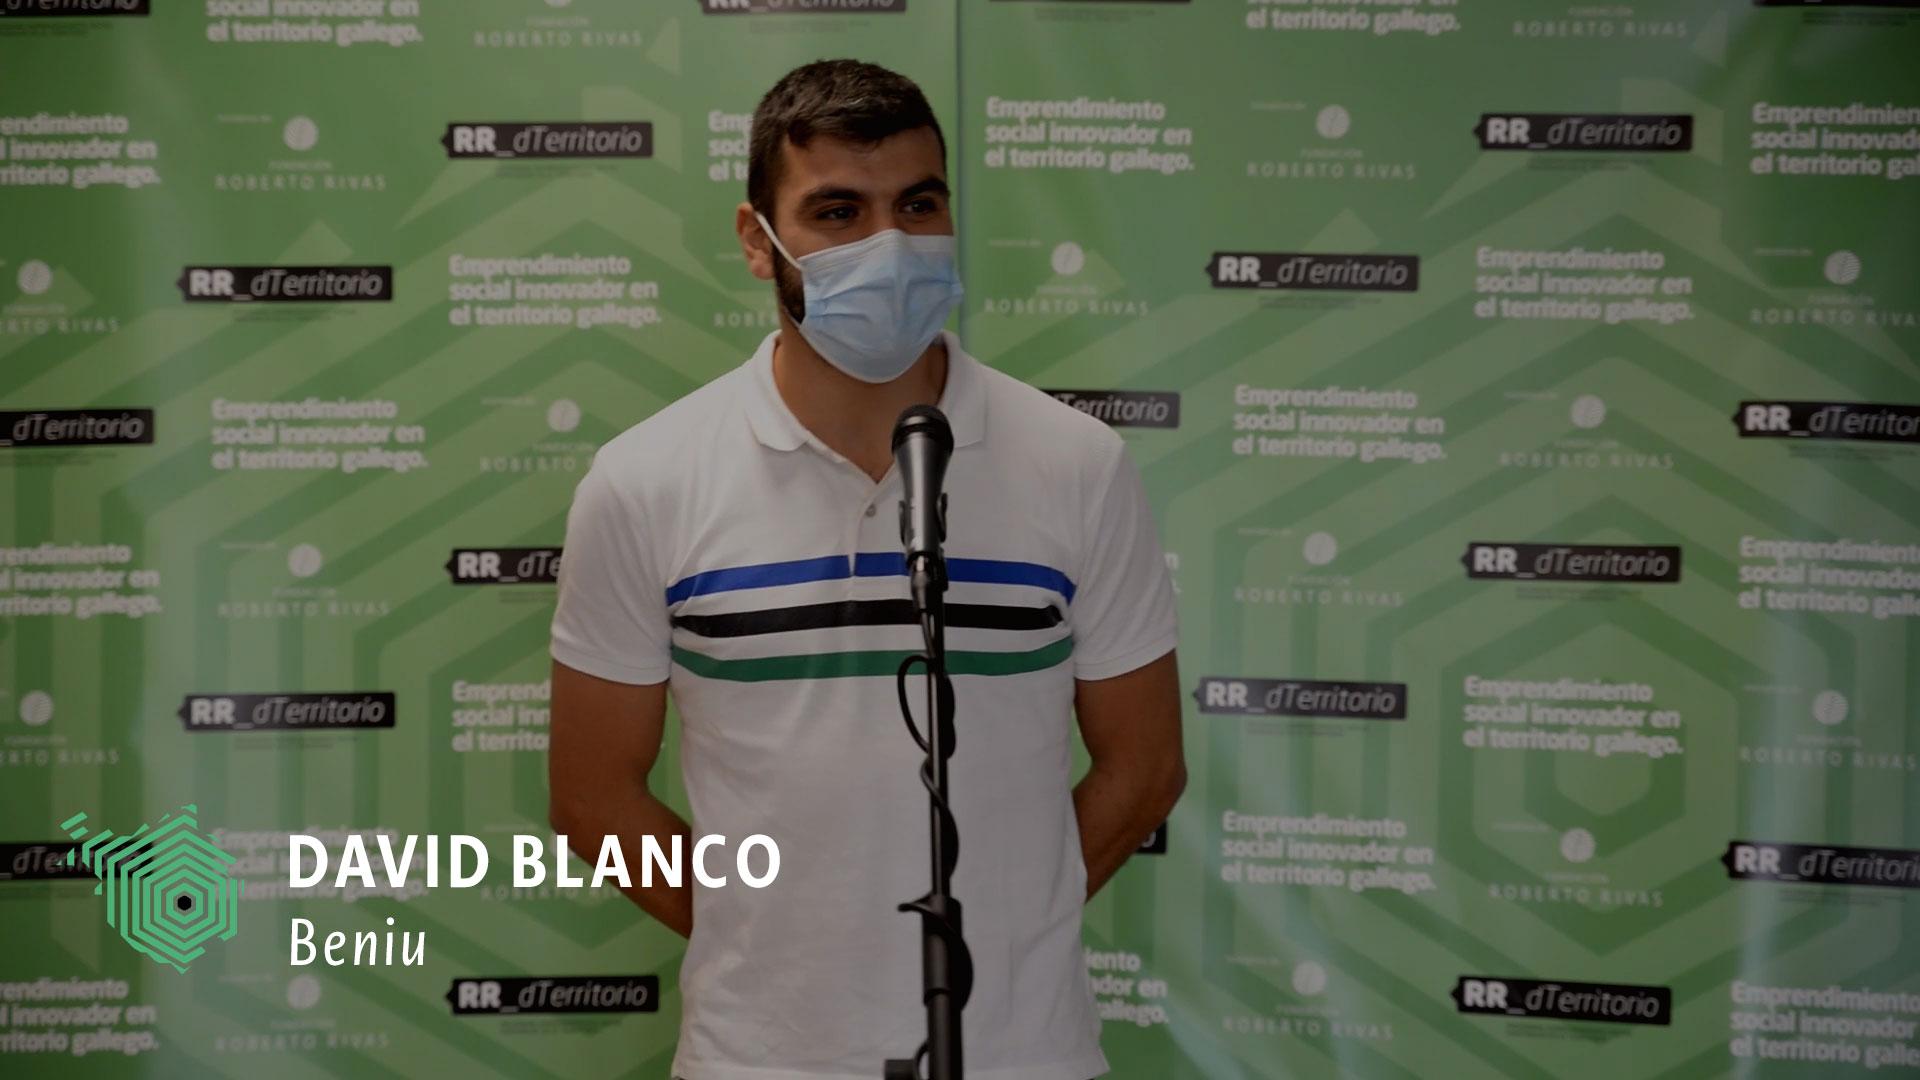 Beniu de David Blanco